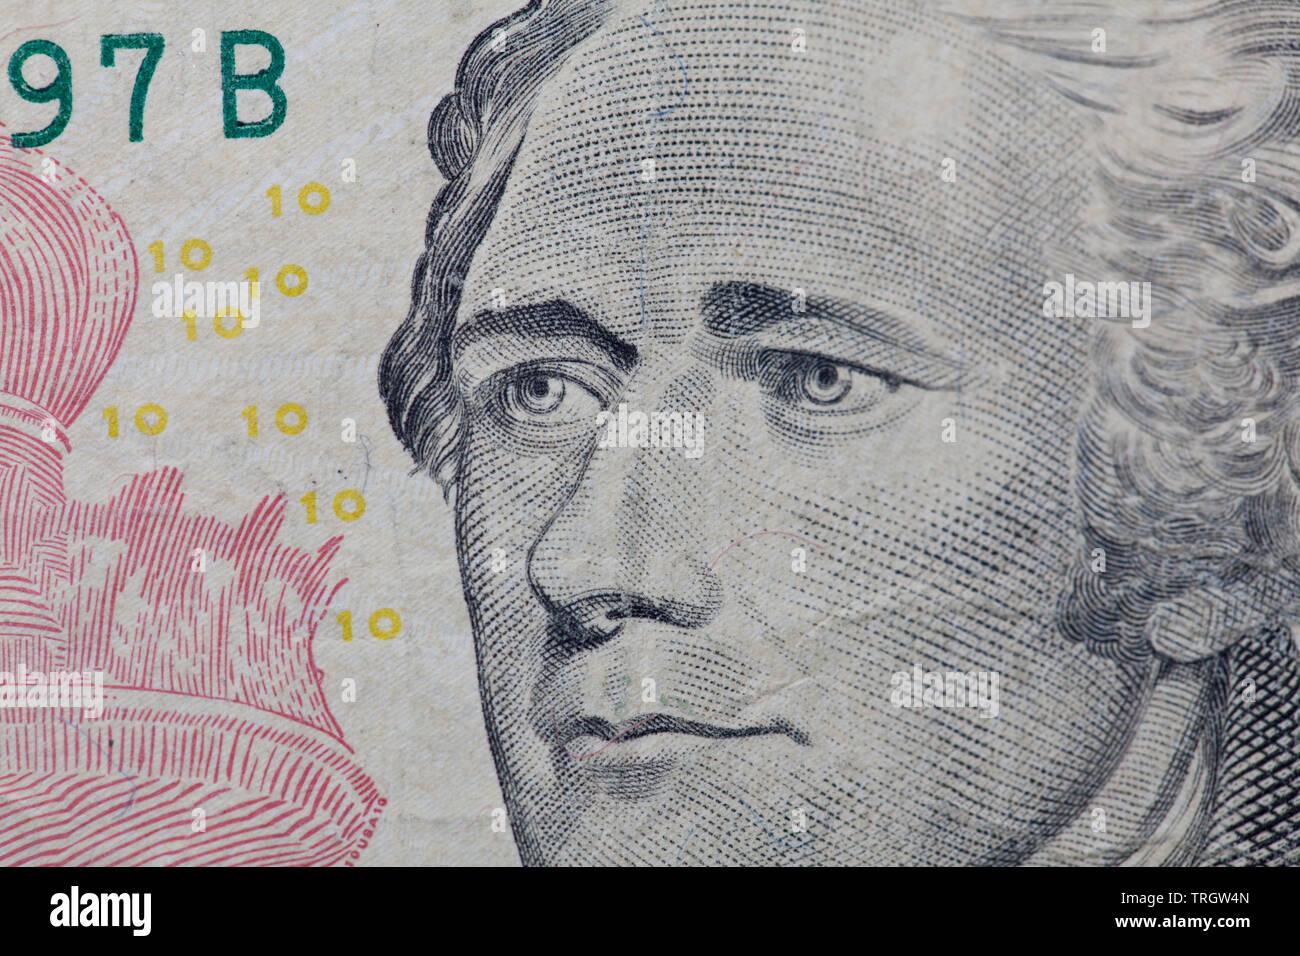 10 Dollar Bill Stock Photos & 10 Dollar Bill Stock Images